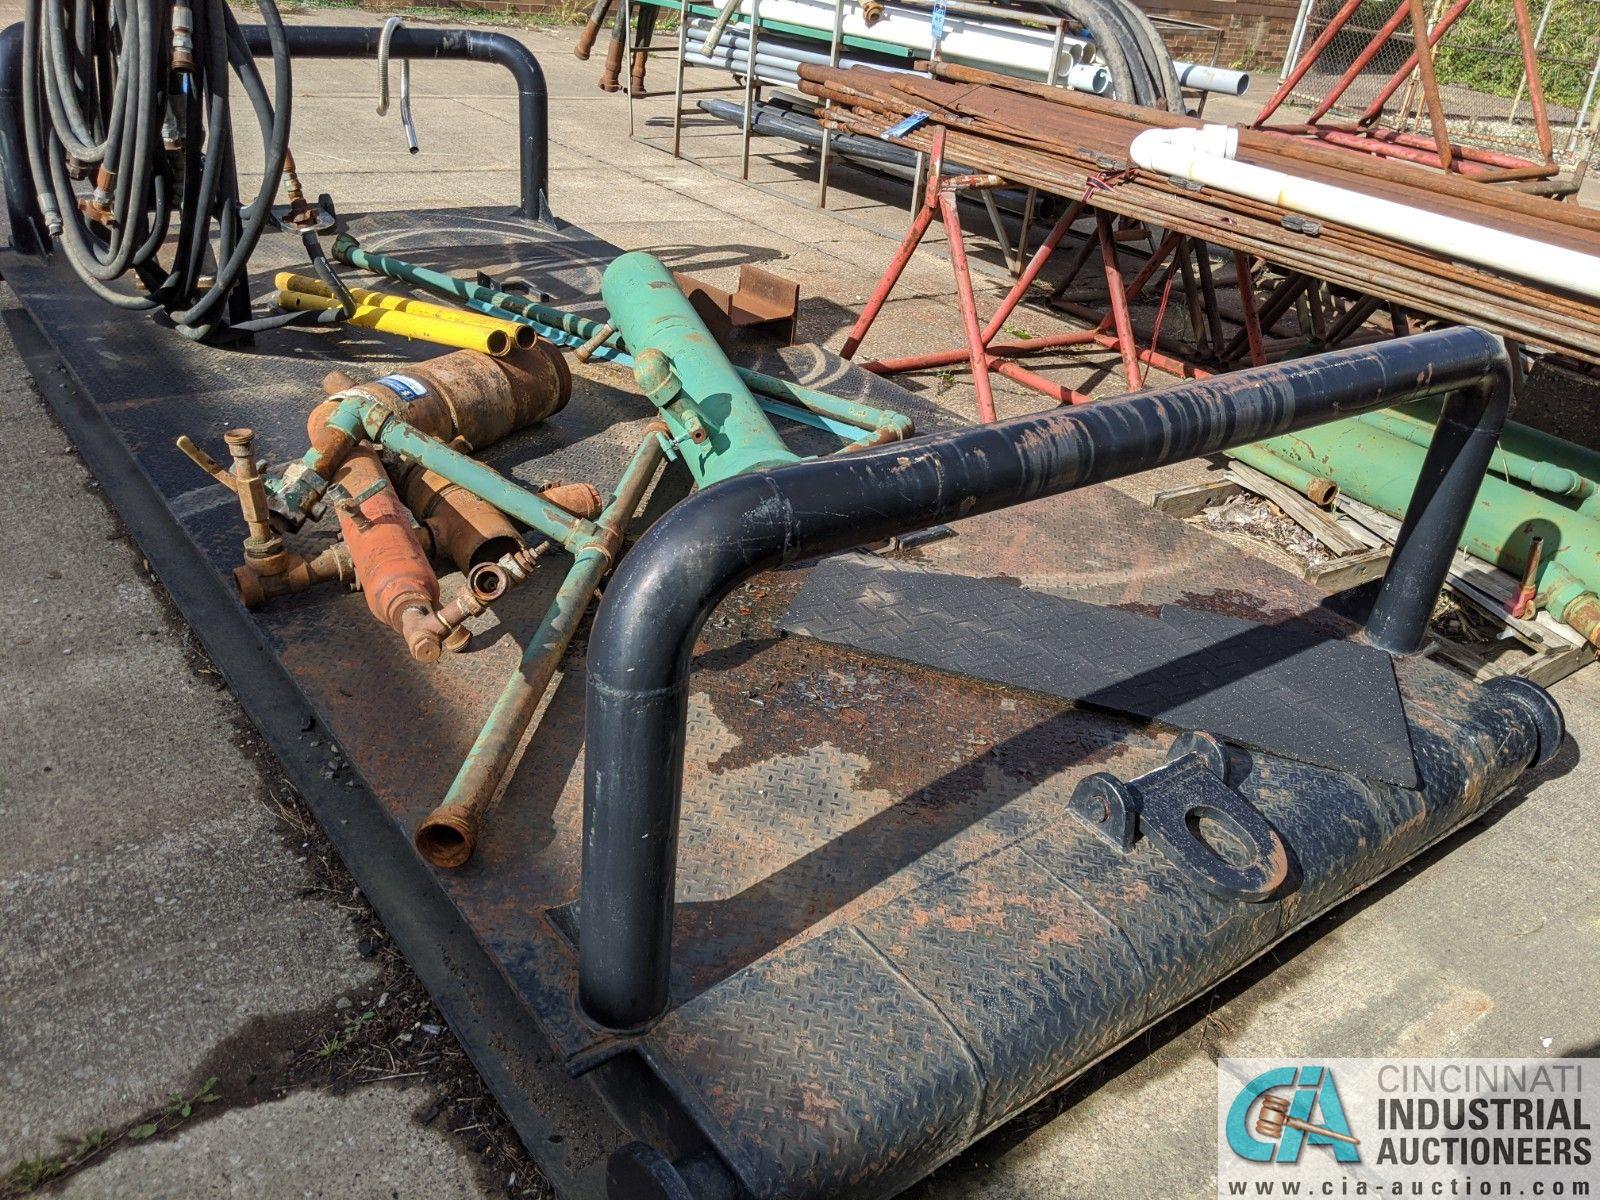 7' WIDE X 14' STEEL SKID (8635 East Ave., Mentor, OH 44060 - John Magnasum: 440-667-9414) - Image 3 of 3